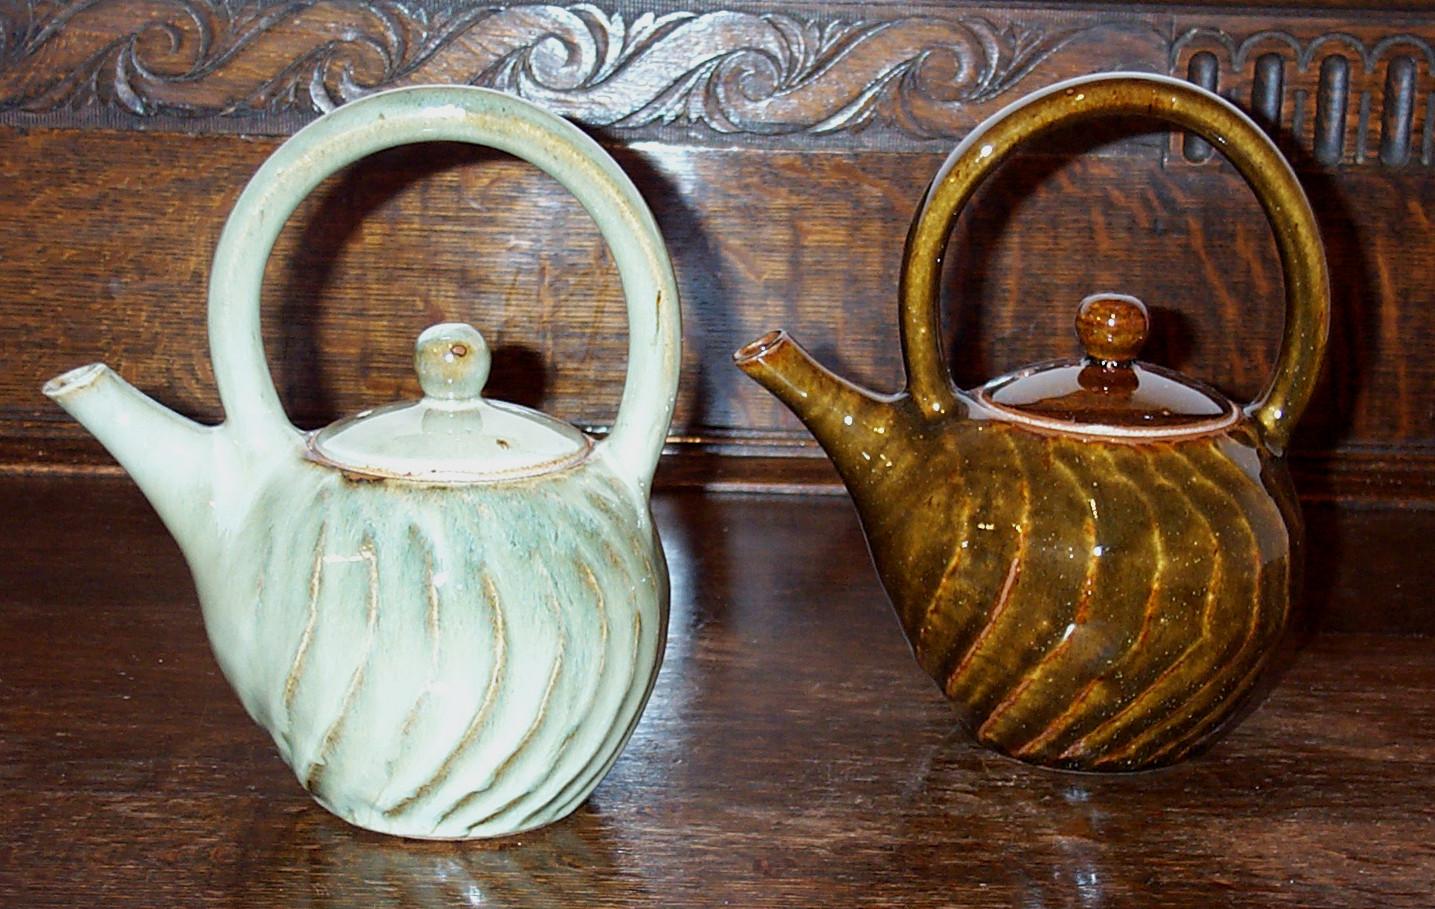 859-860  teapots.jpg